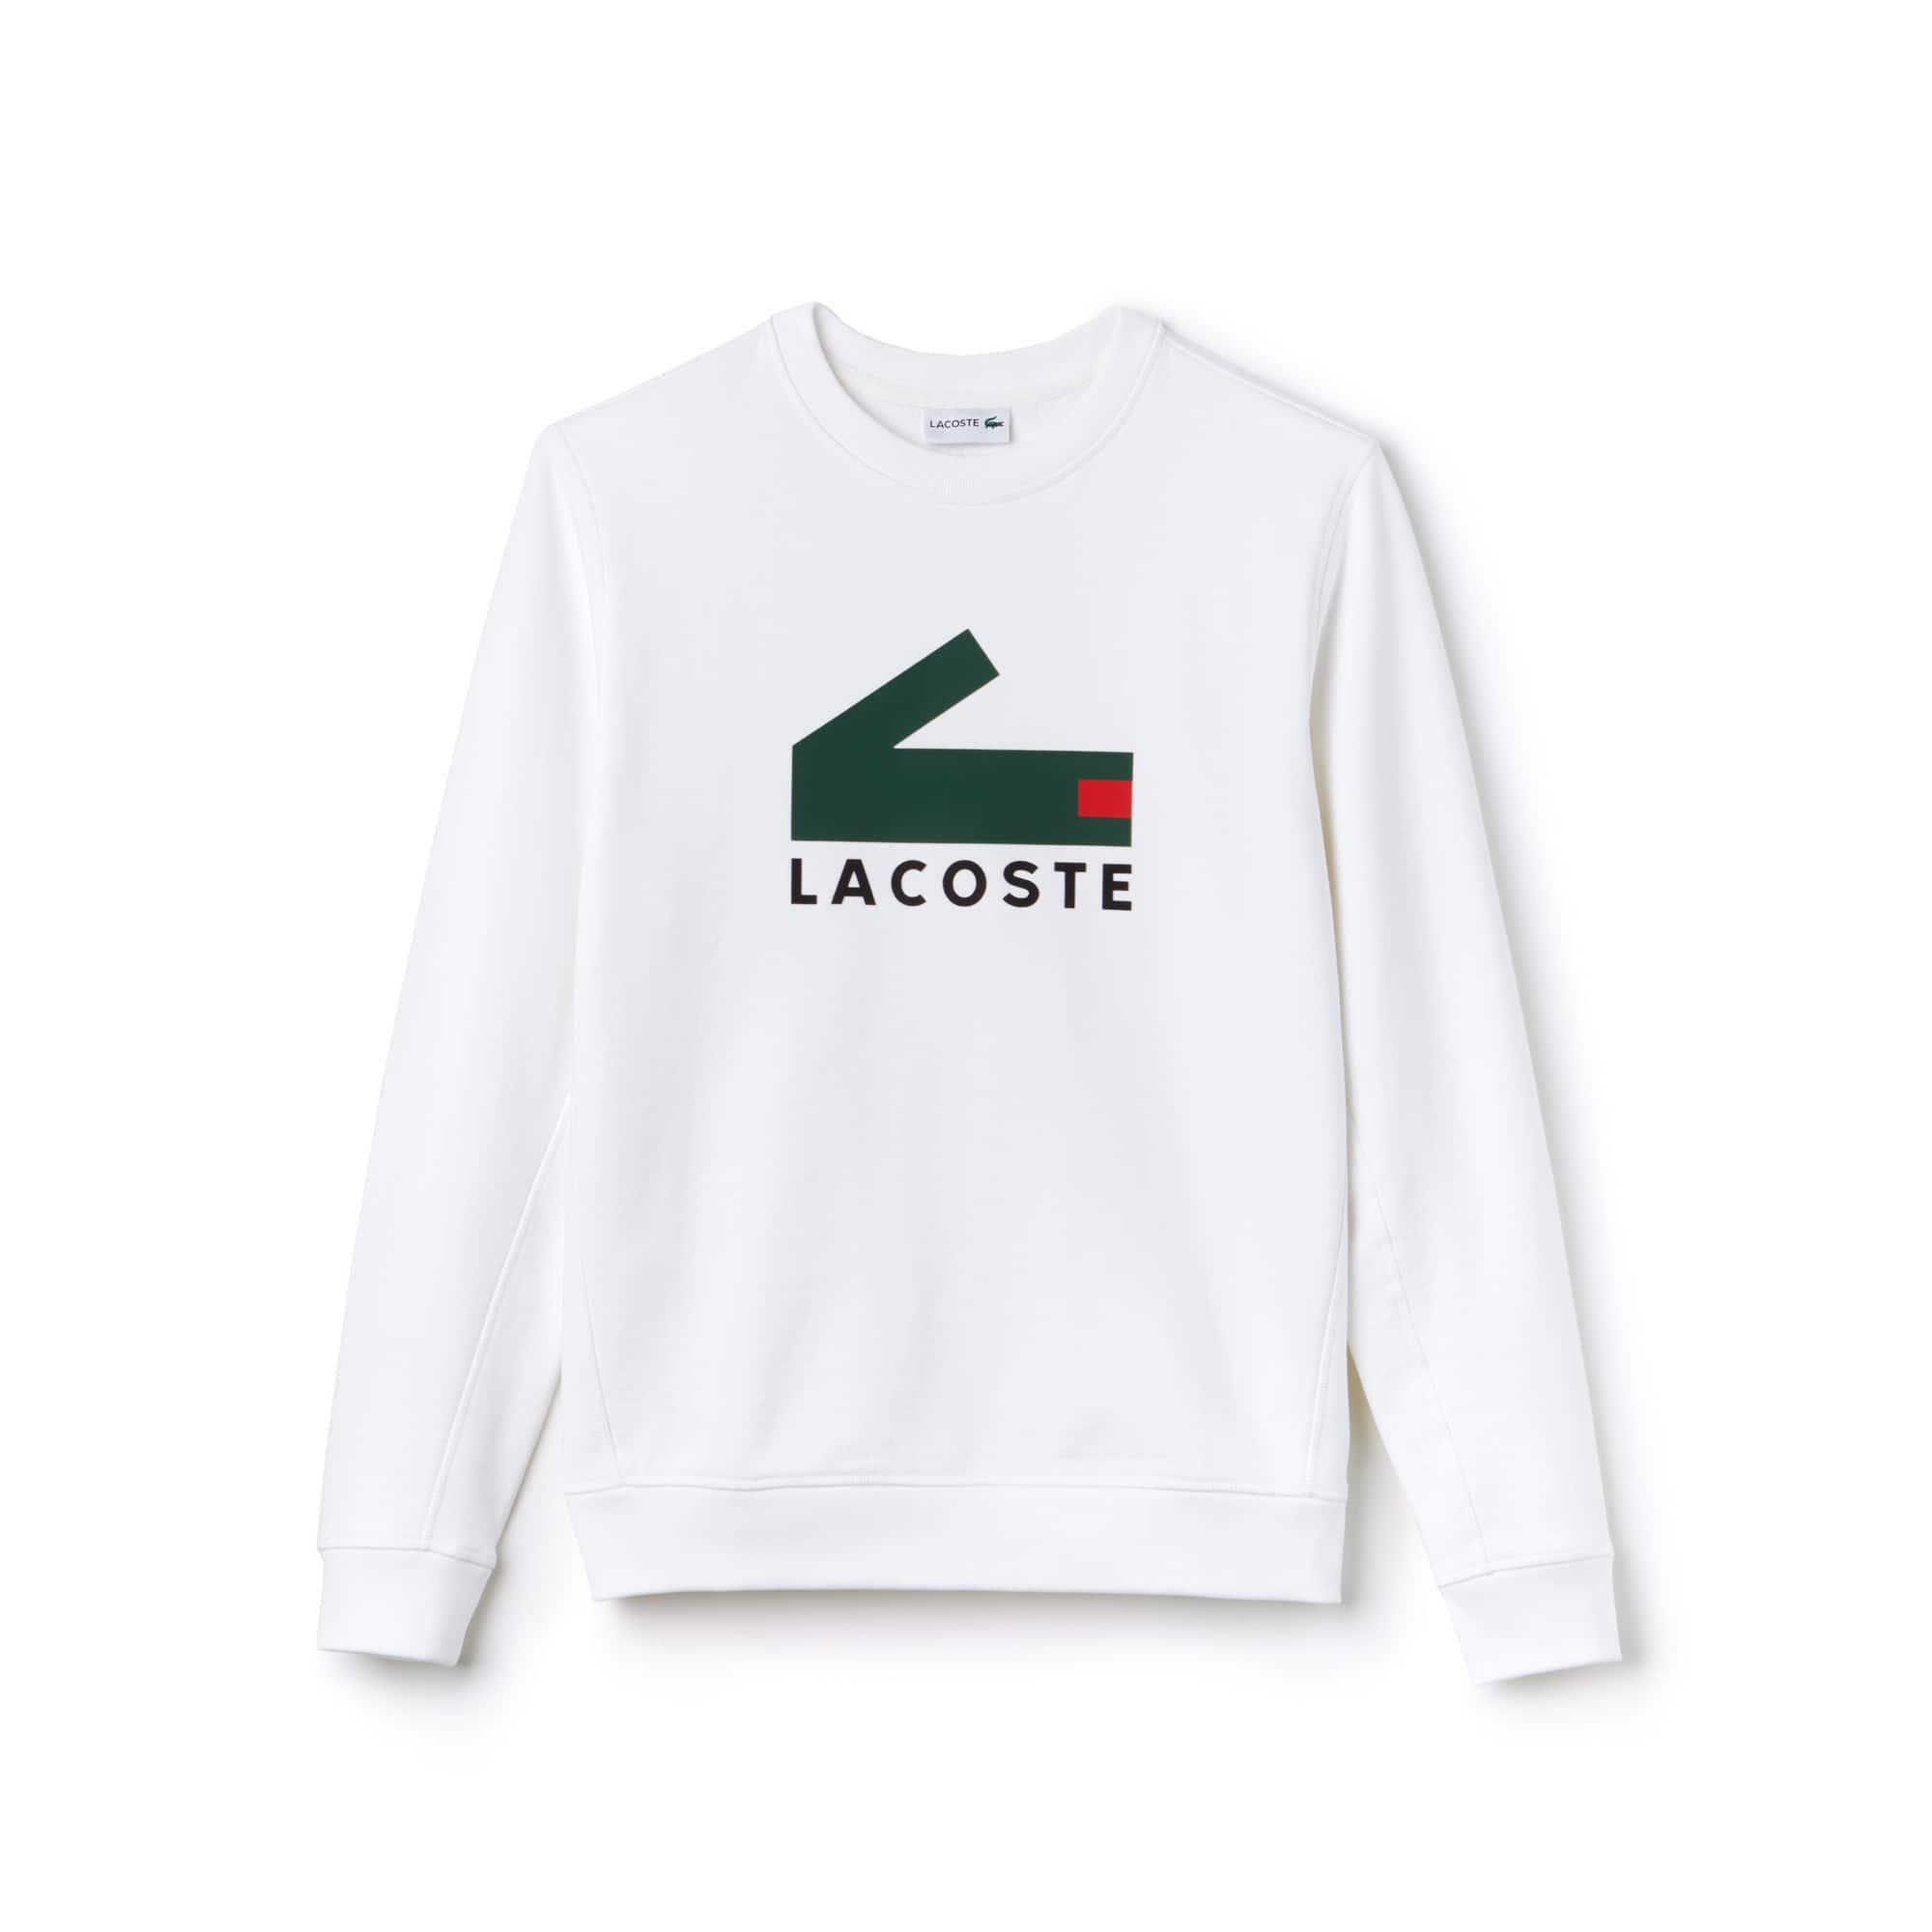 Sweatshirt en molleton de coton avec impression crocodile